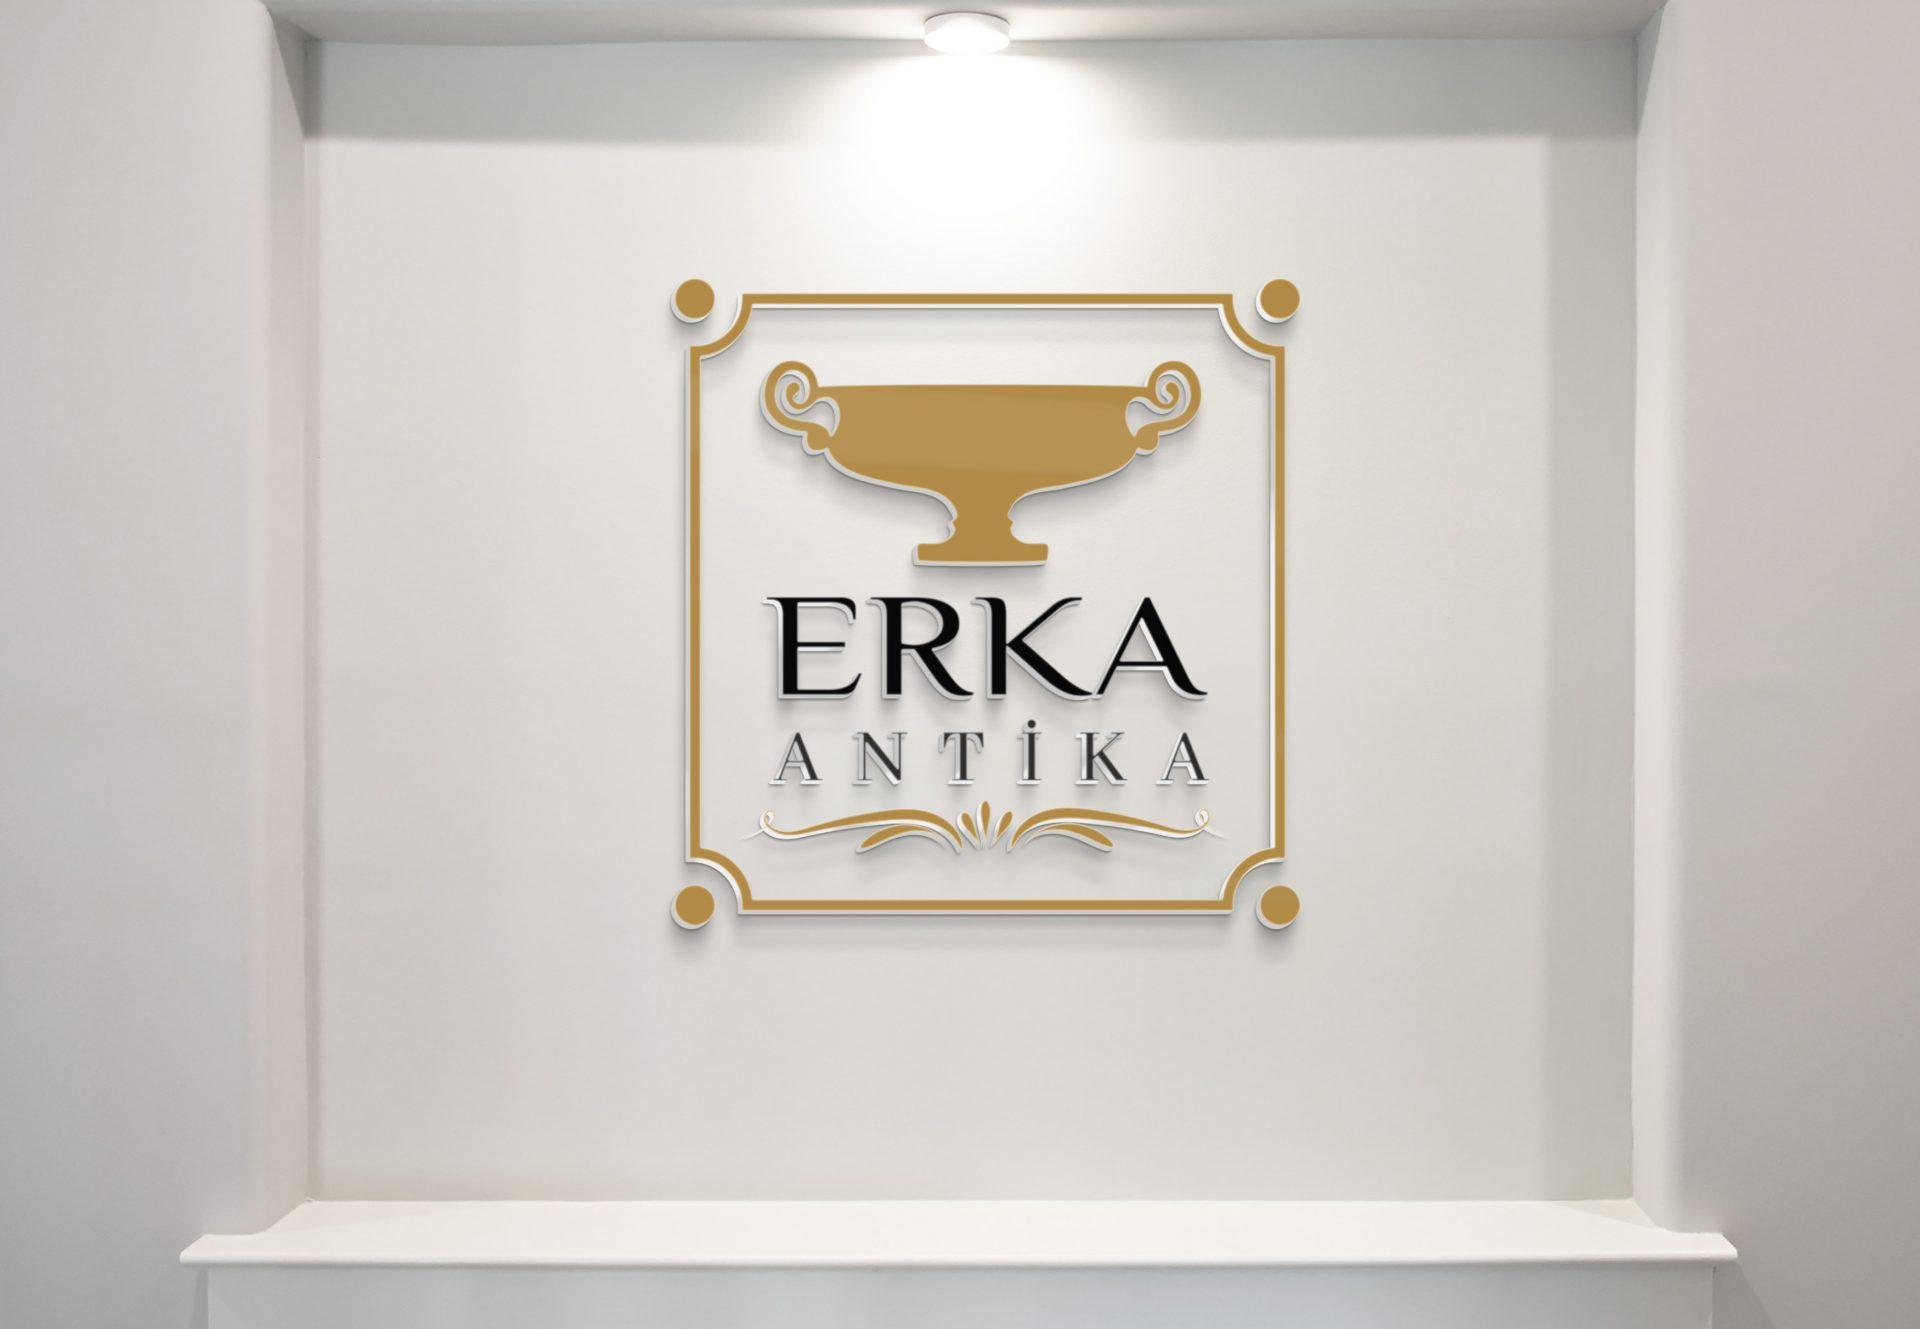 erka antika logo